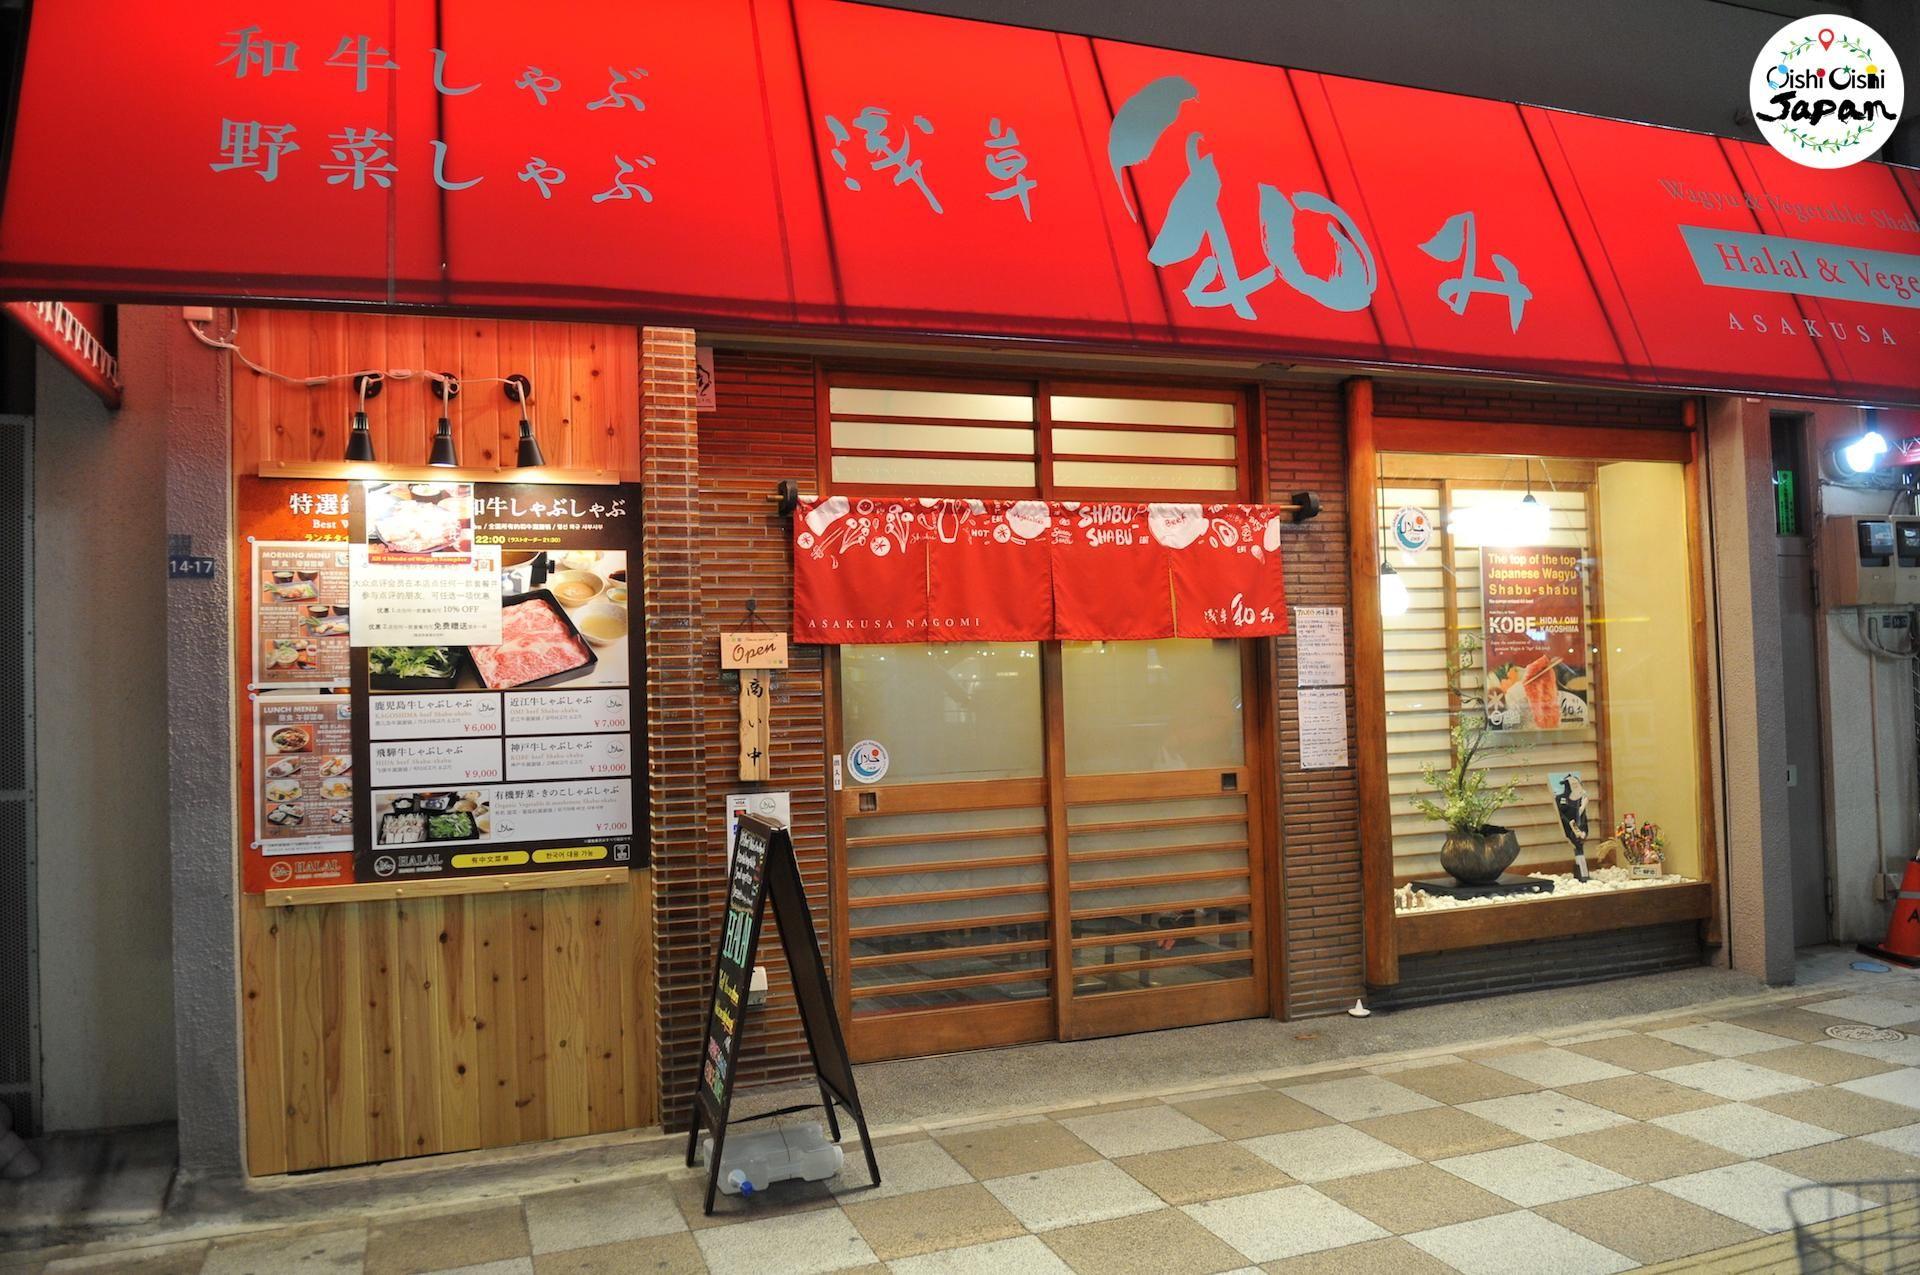 Pin By Kaltham Kenaid On Tokyo Japanese Food Sushi Set Tokyo